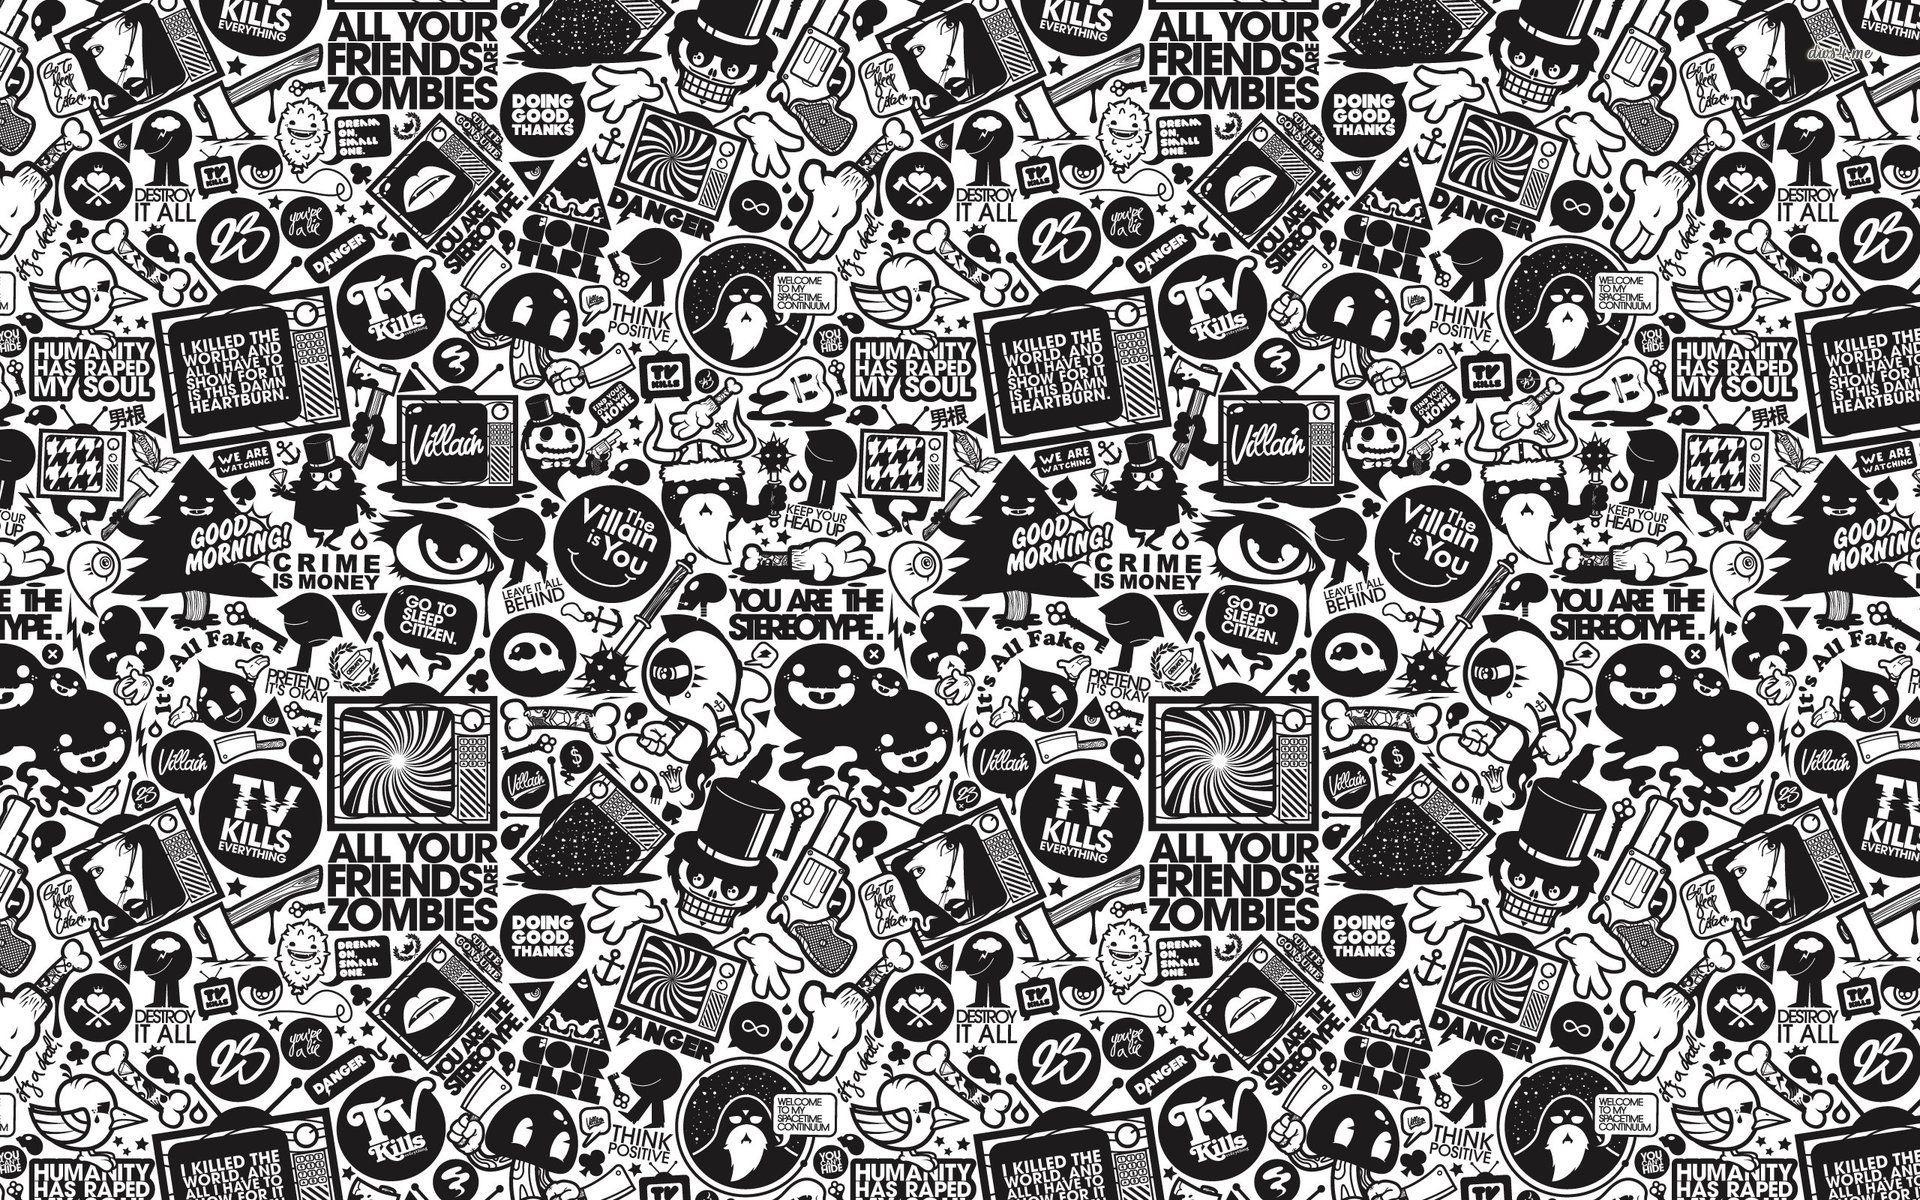 wallpaper tumblr black and white - google search   black & white